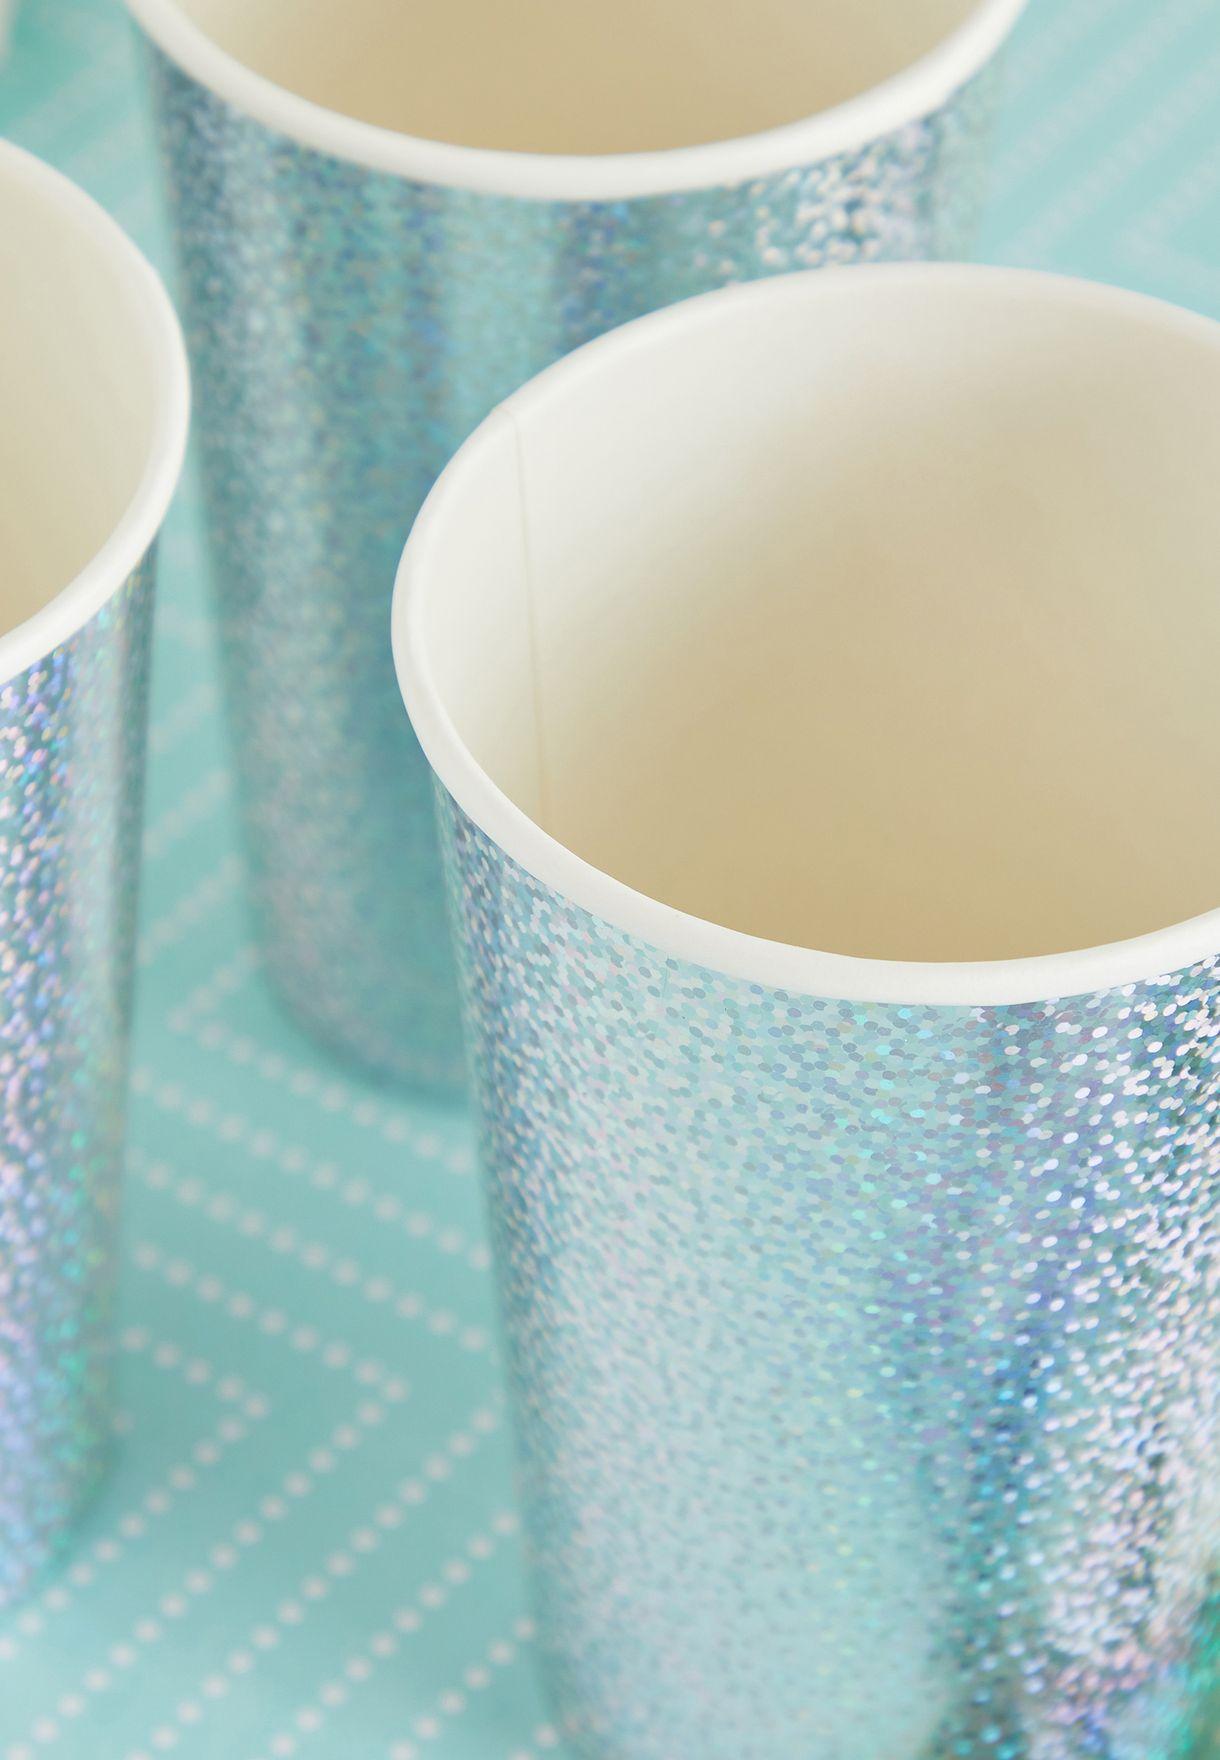 Silver Sparkle Highball Cups